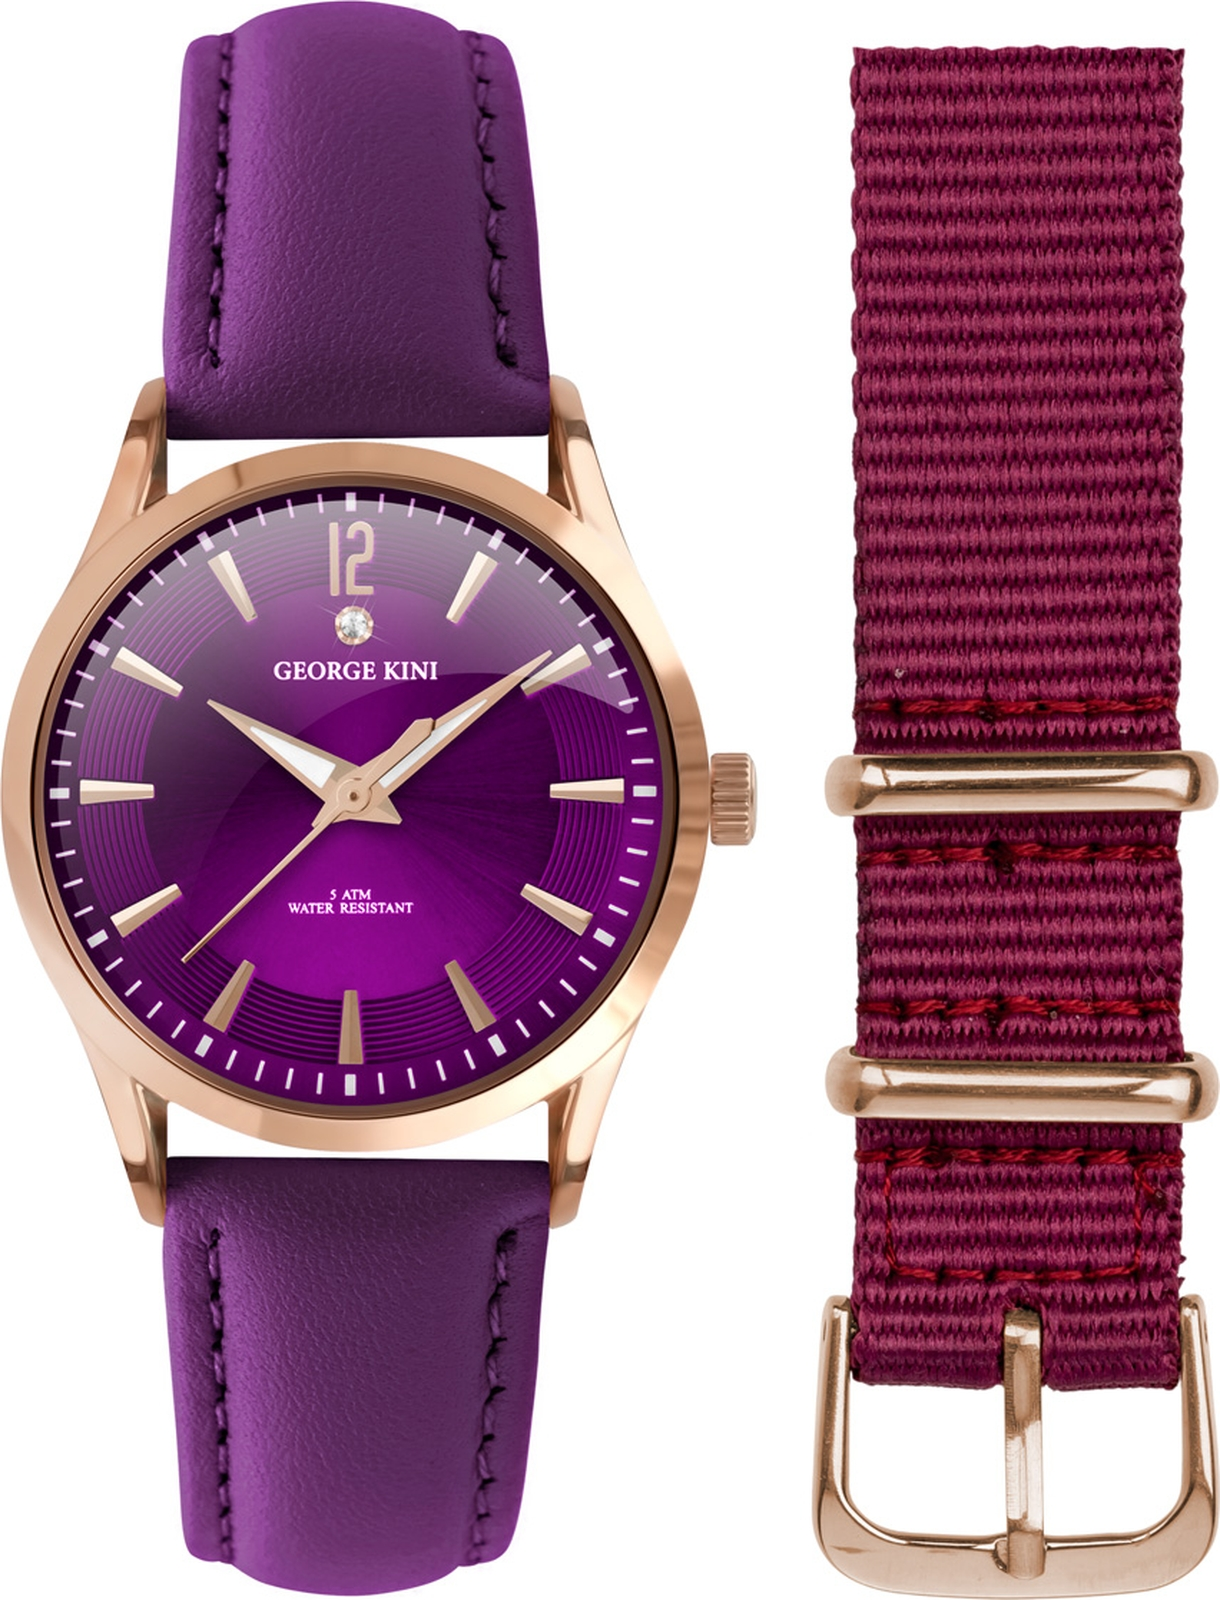 Наручные часы George Kini женские фиолетовый